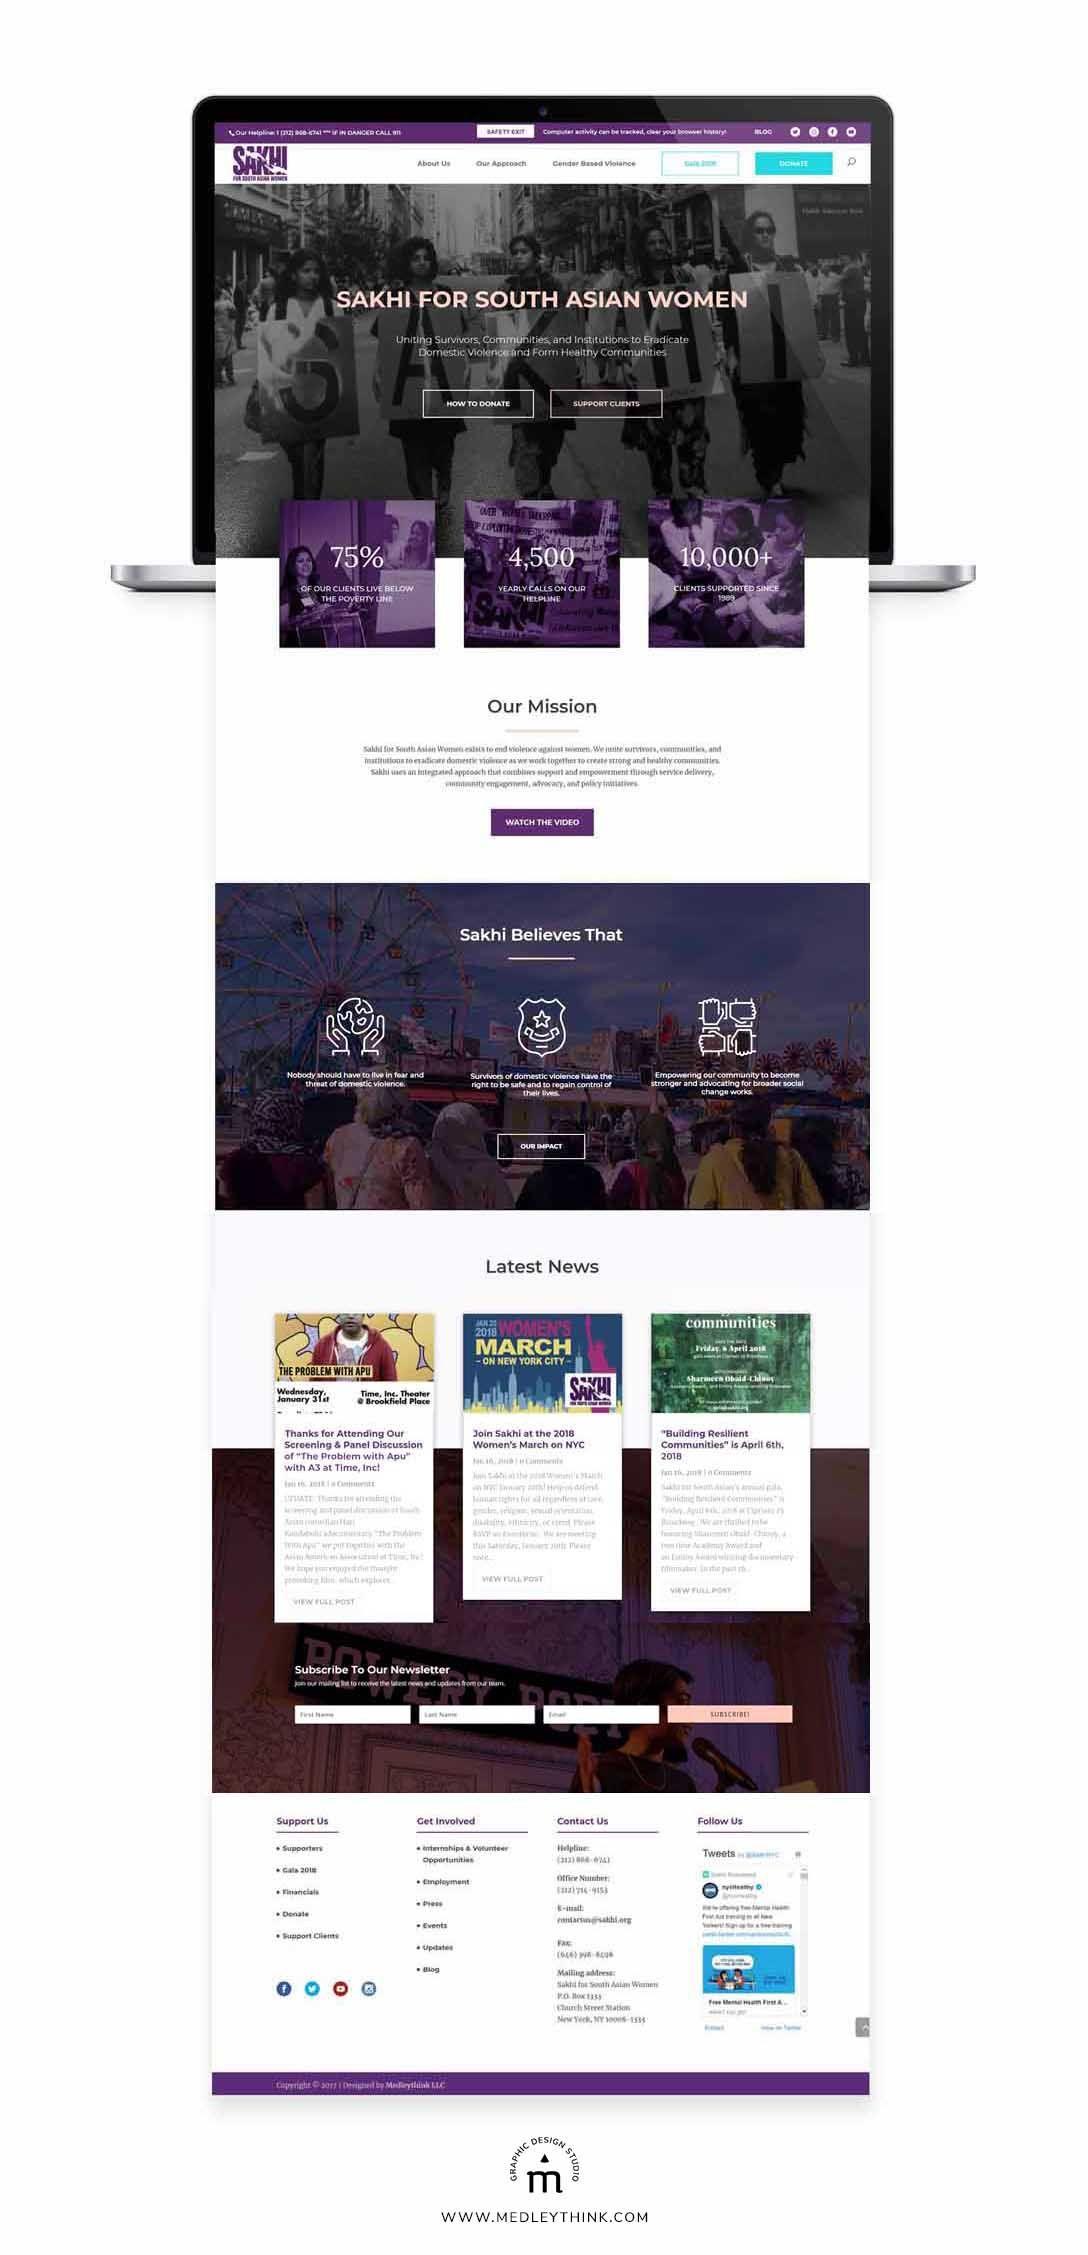 Website Design Services Web Development Design Web Design Website Design Services